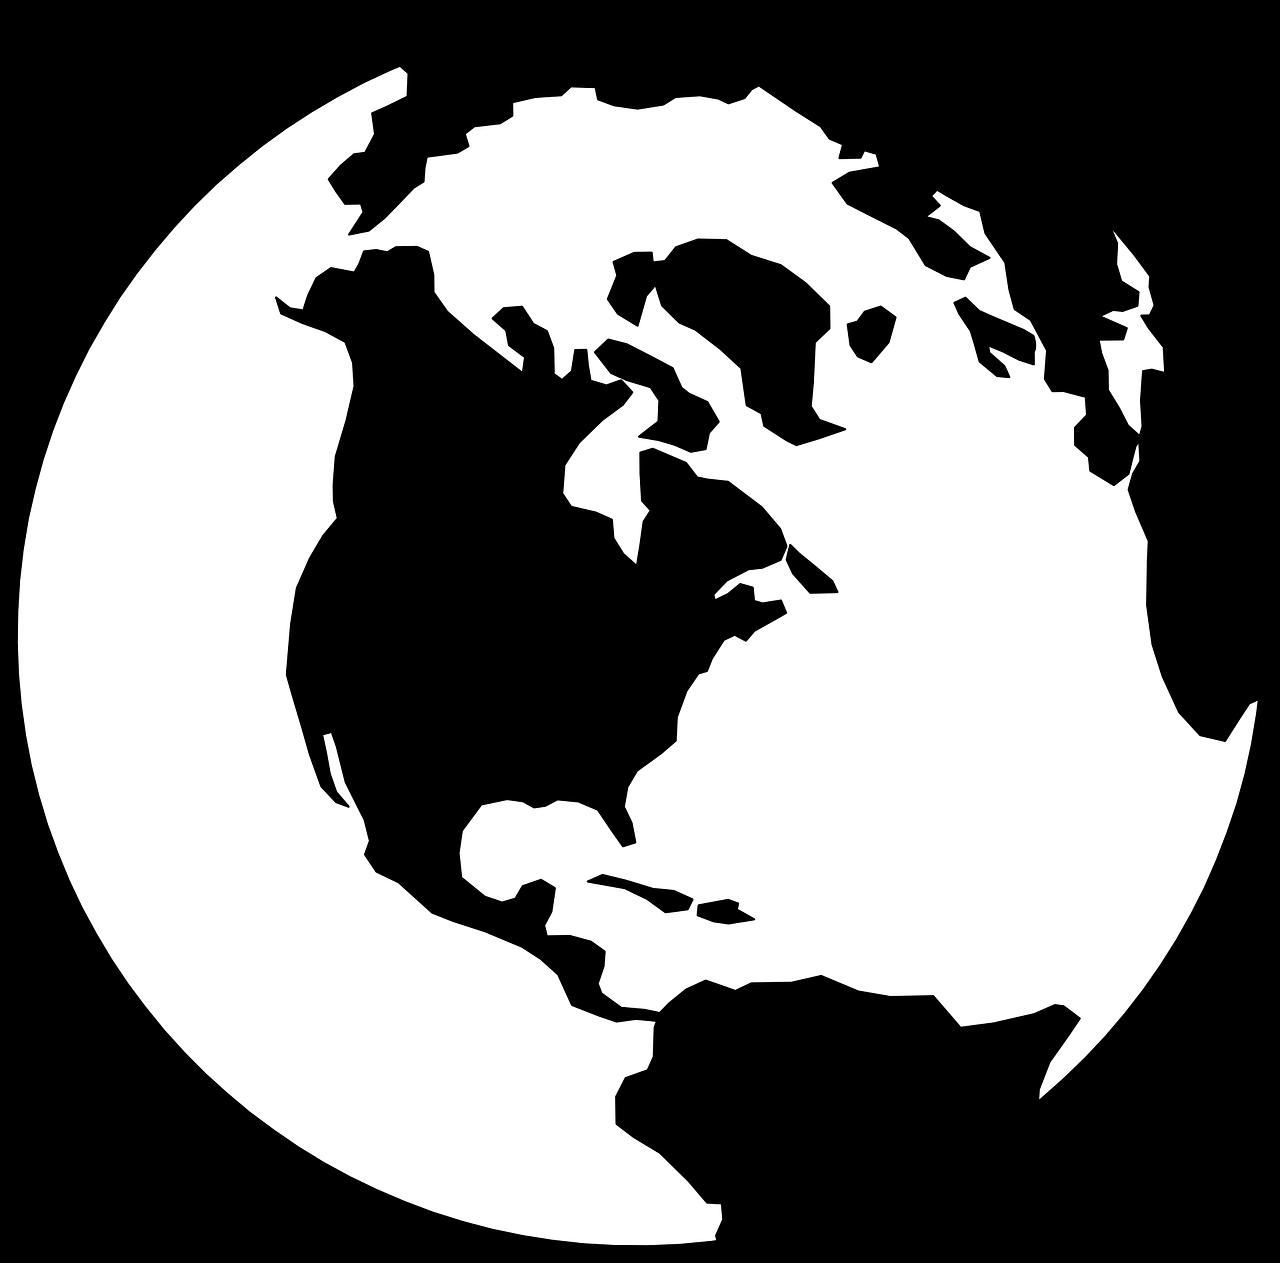 Globe earth black white. Clipart world eath